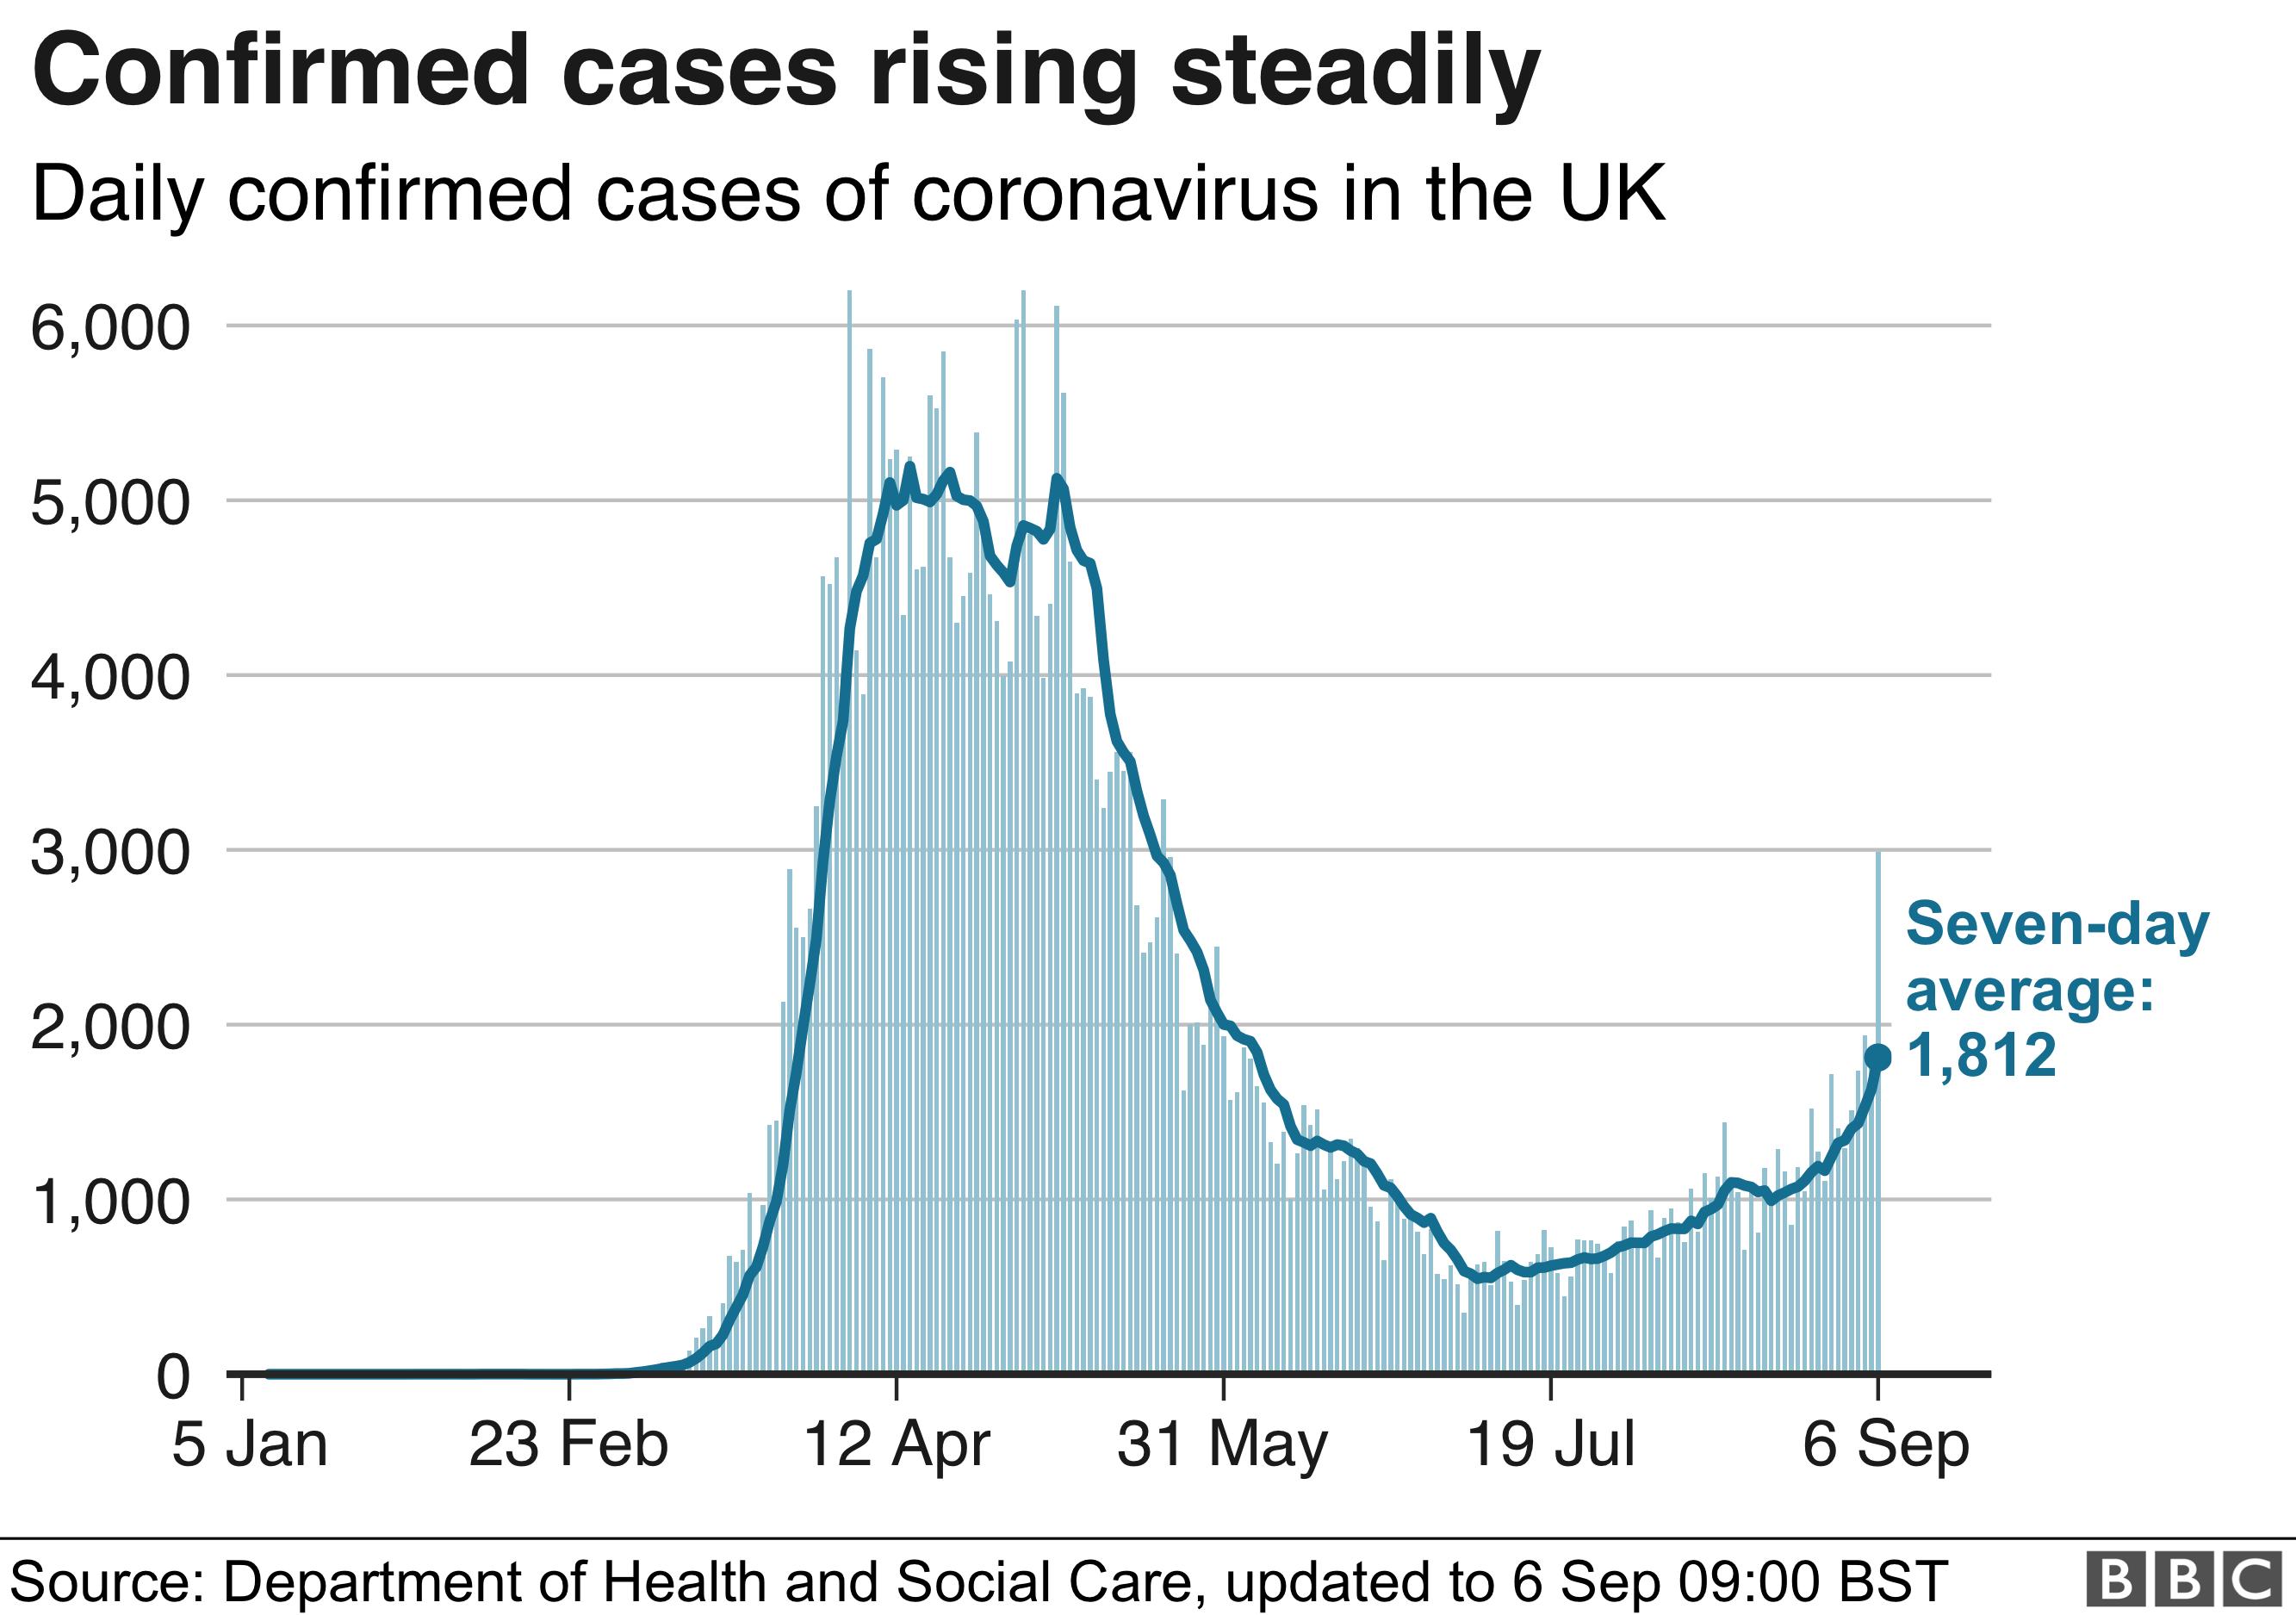 UK confirmed cases 6 September 2020